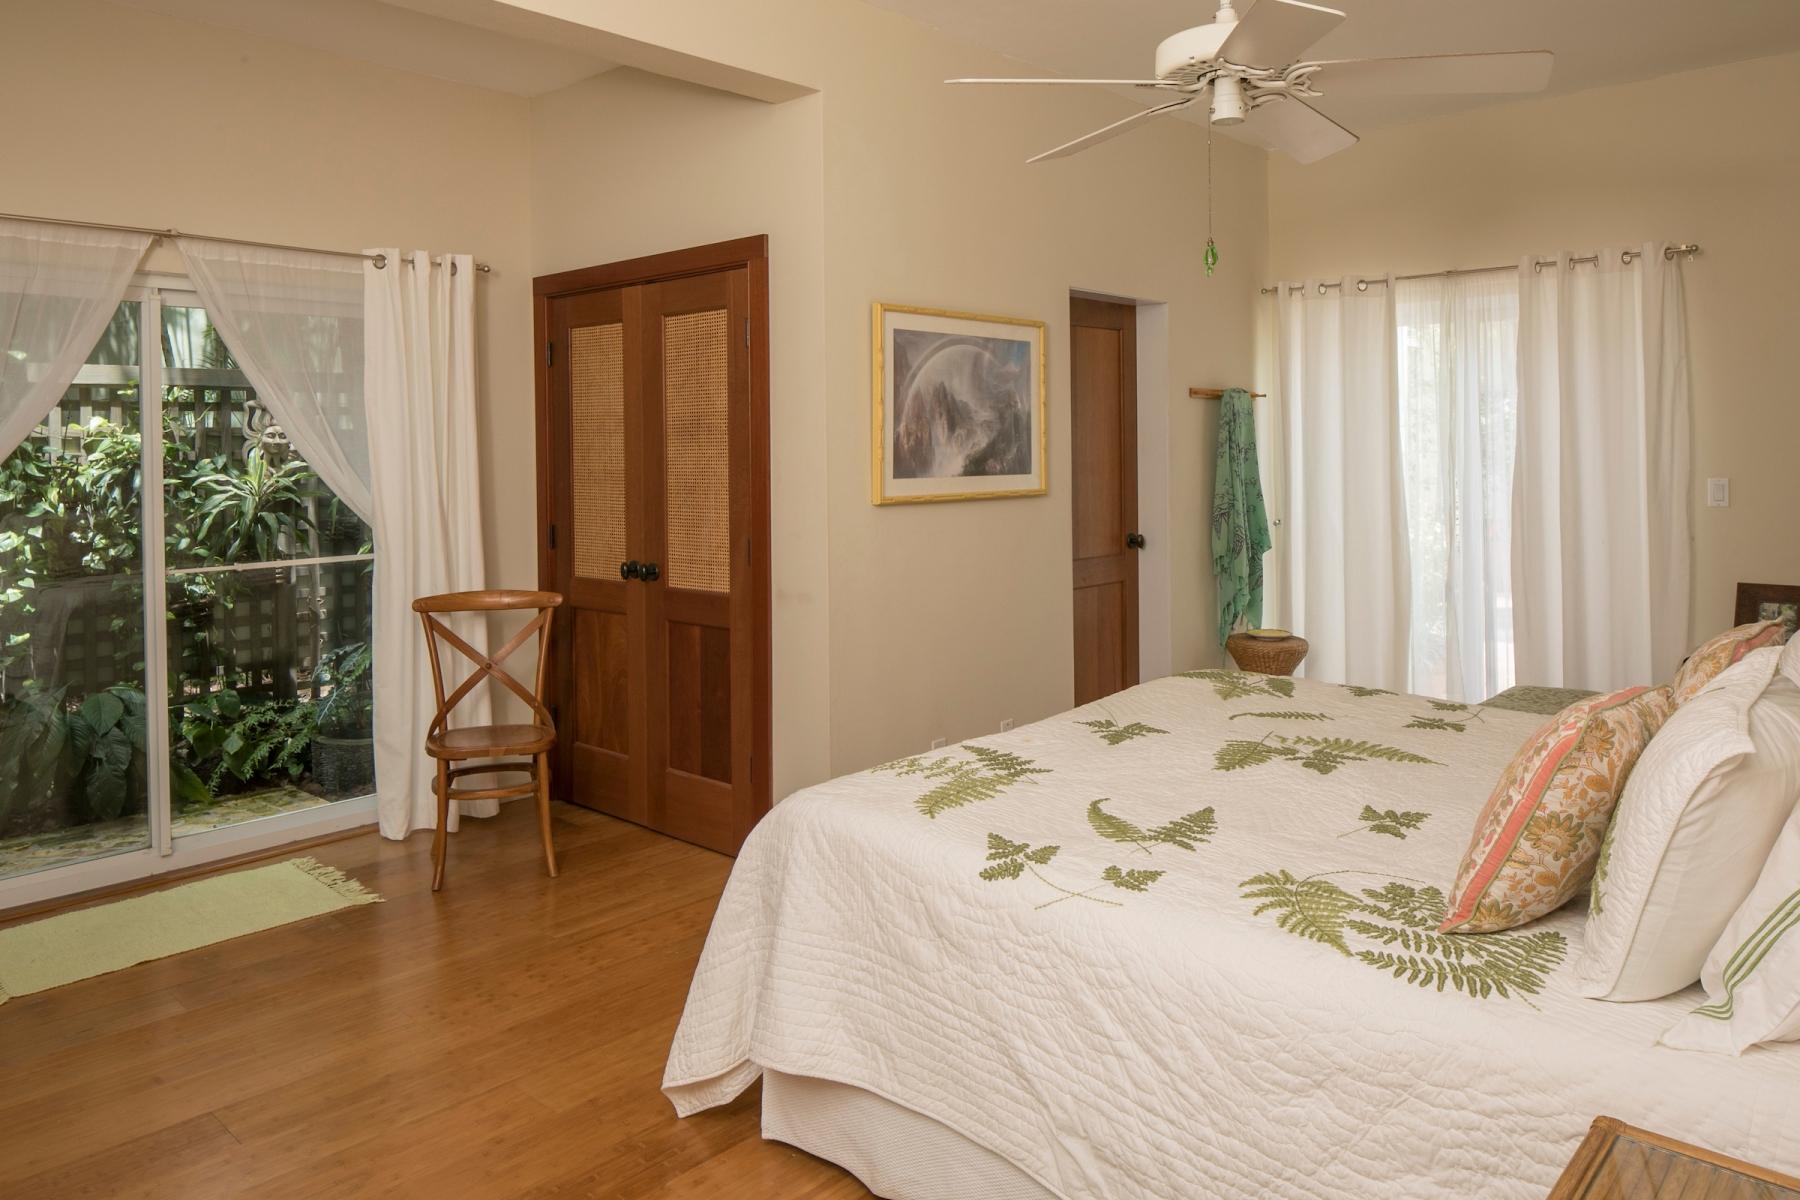 Additional photo for property listing at El Capitan del Sol 201 Estate Contant & Enighed St John, Virgin Islands 00830 United States Virgin Islands